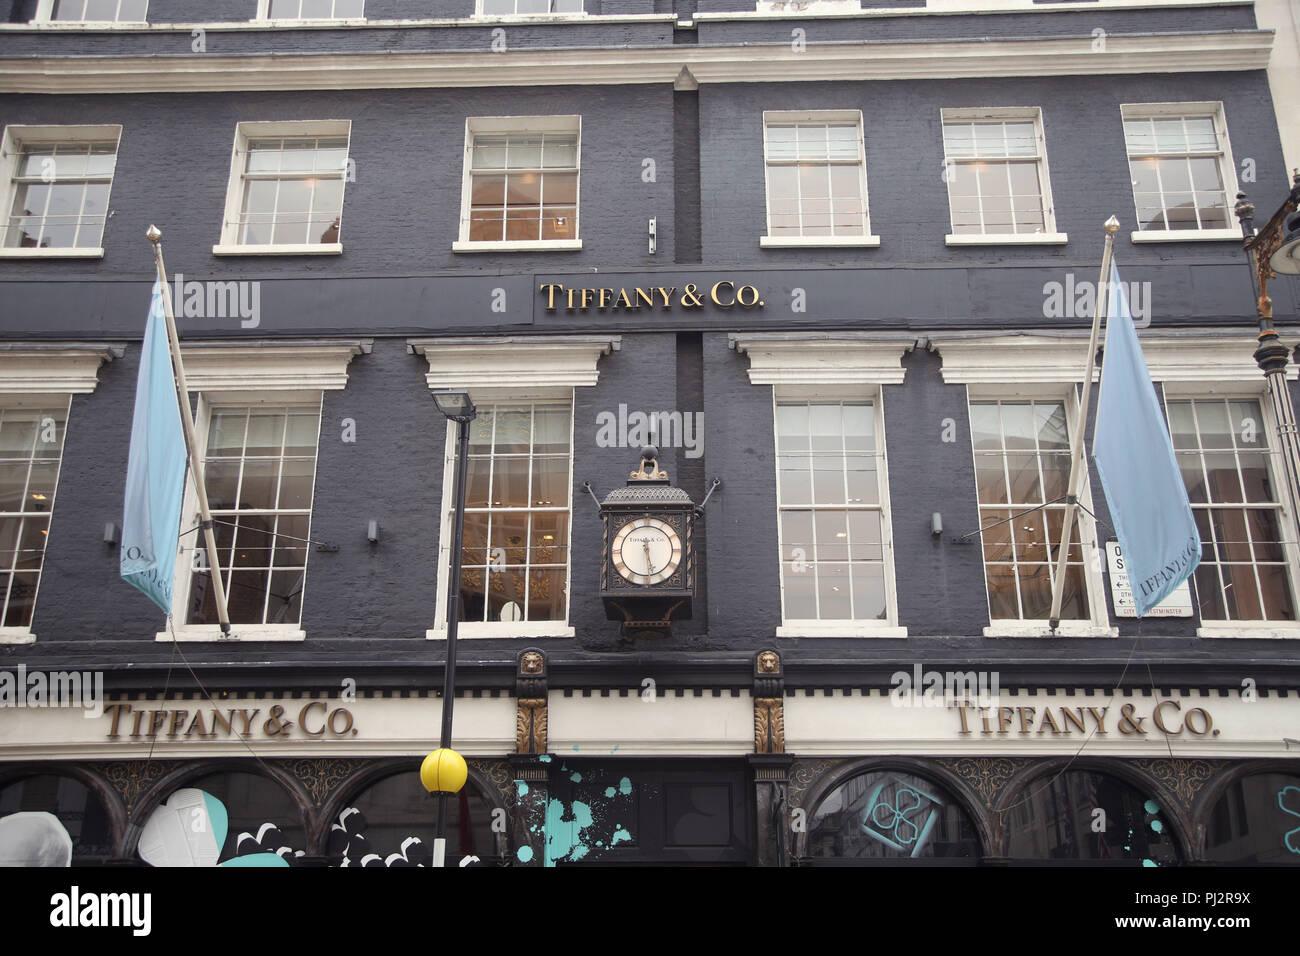 bfb28300ba68 The Tiffany   Co store on New Bond Street